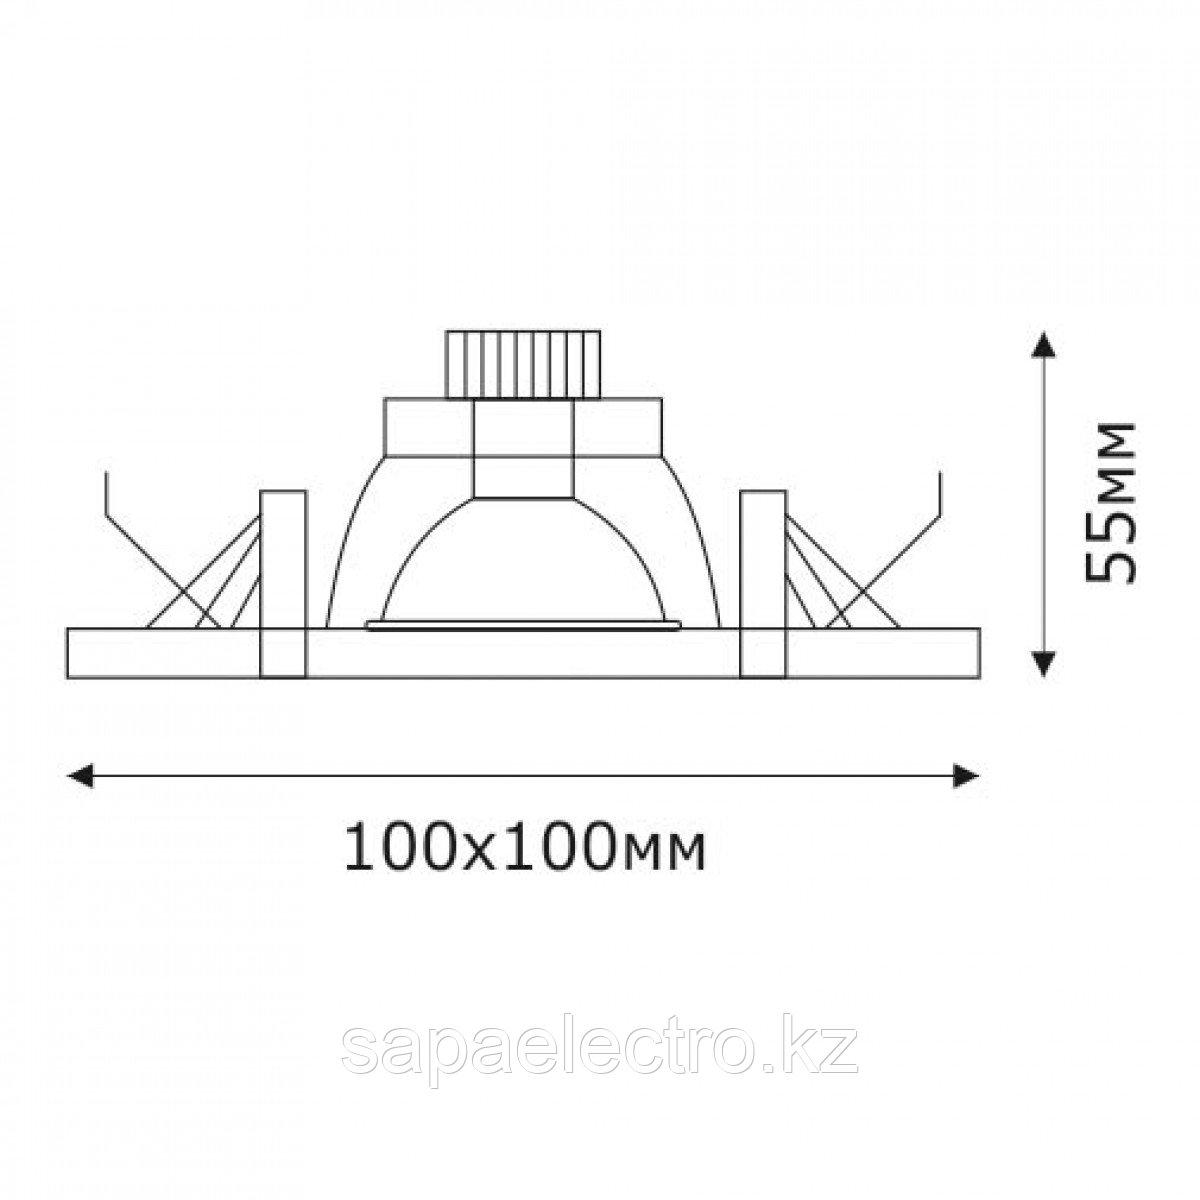 Спот LED QS-G27AB SQUARE 3W 5000K (TS) 60шт